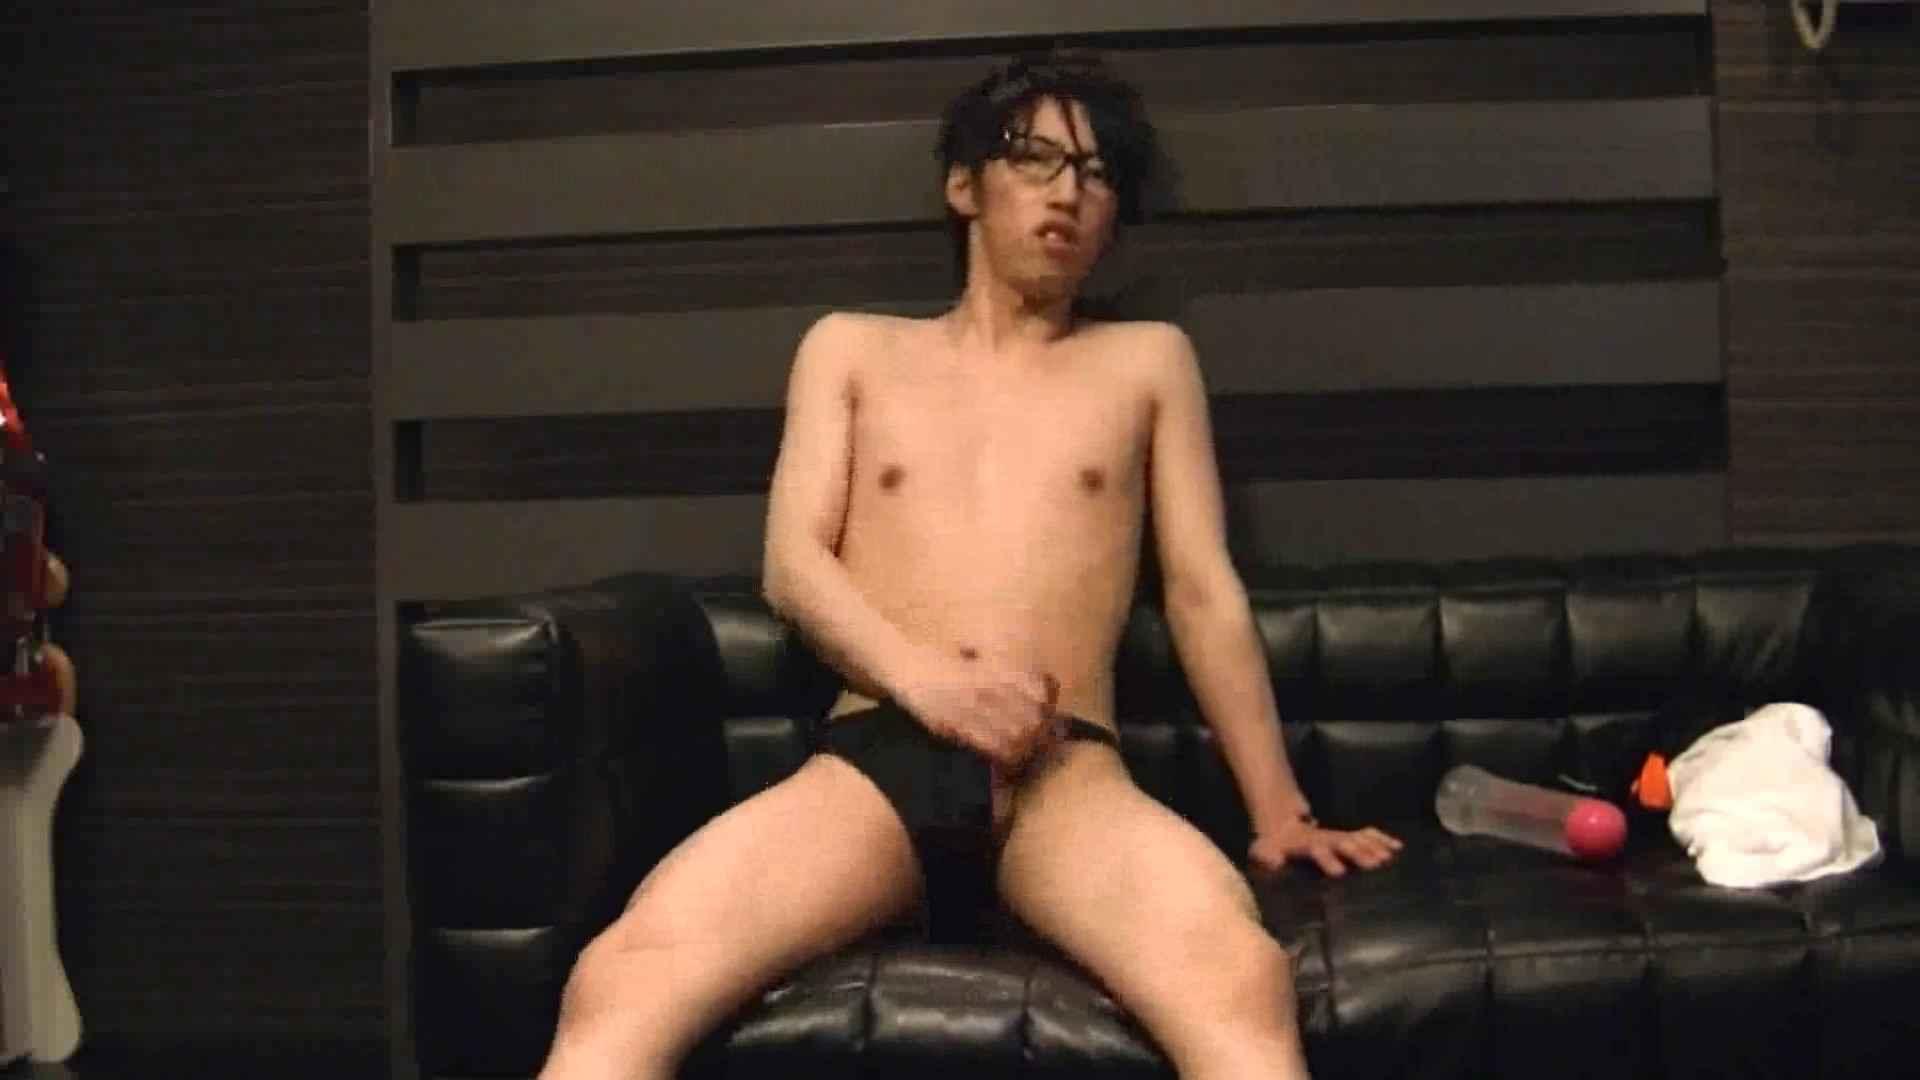 ONA見せカーニバル!! Vol3 男・男 ゲイ無料無修正画像 72pic 48